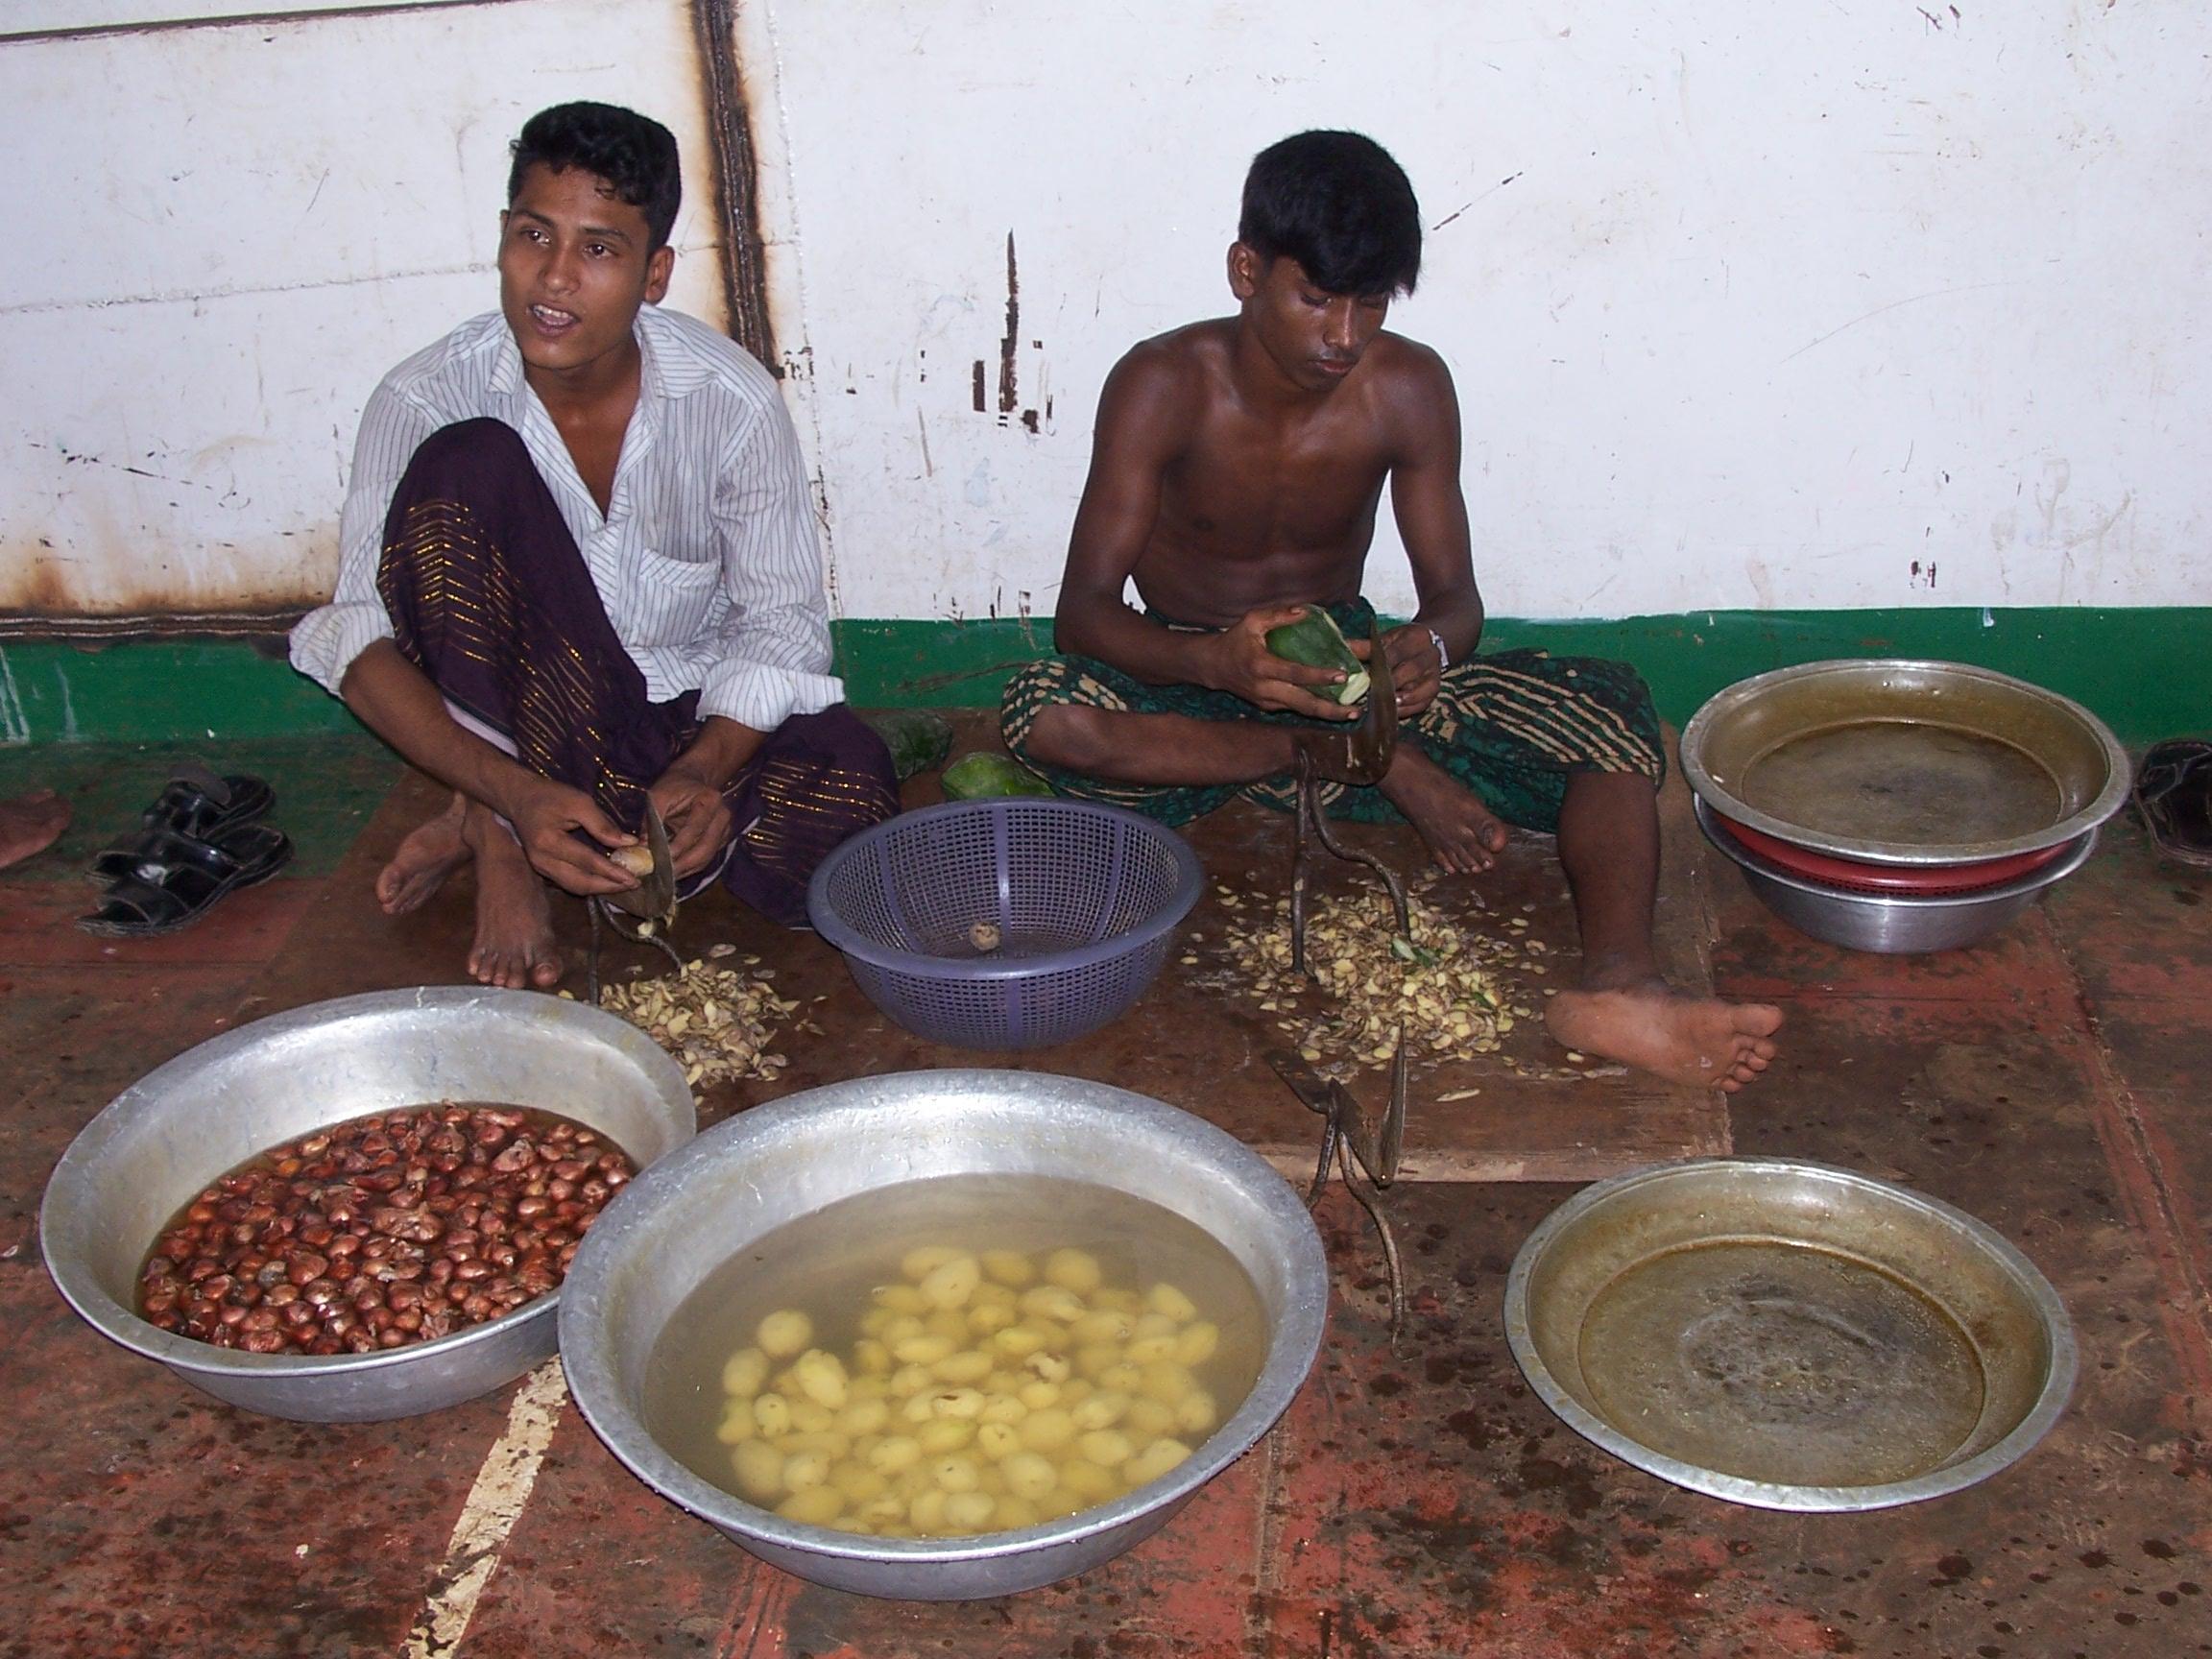 Two men cooking vegetables